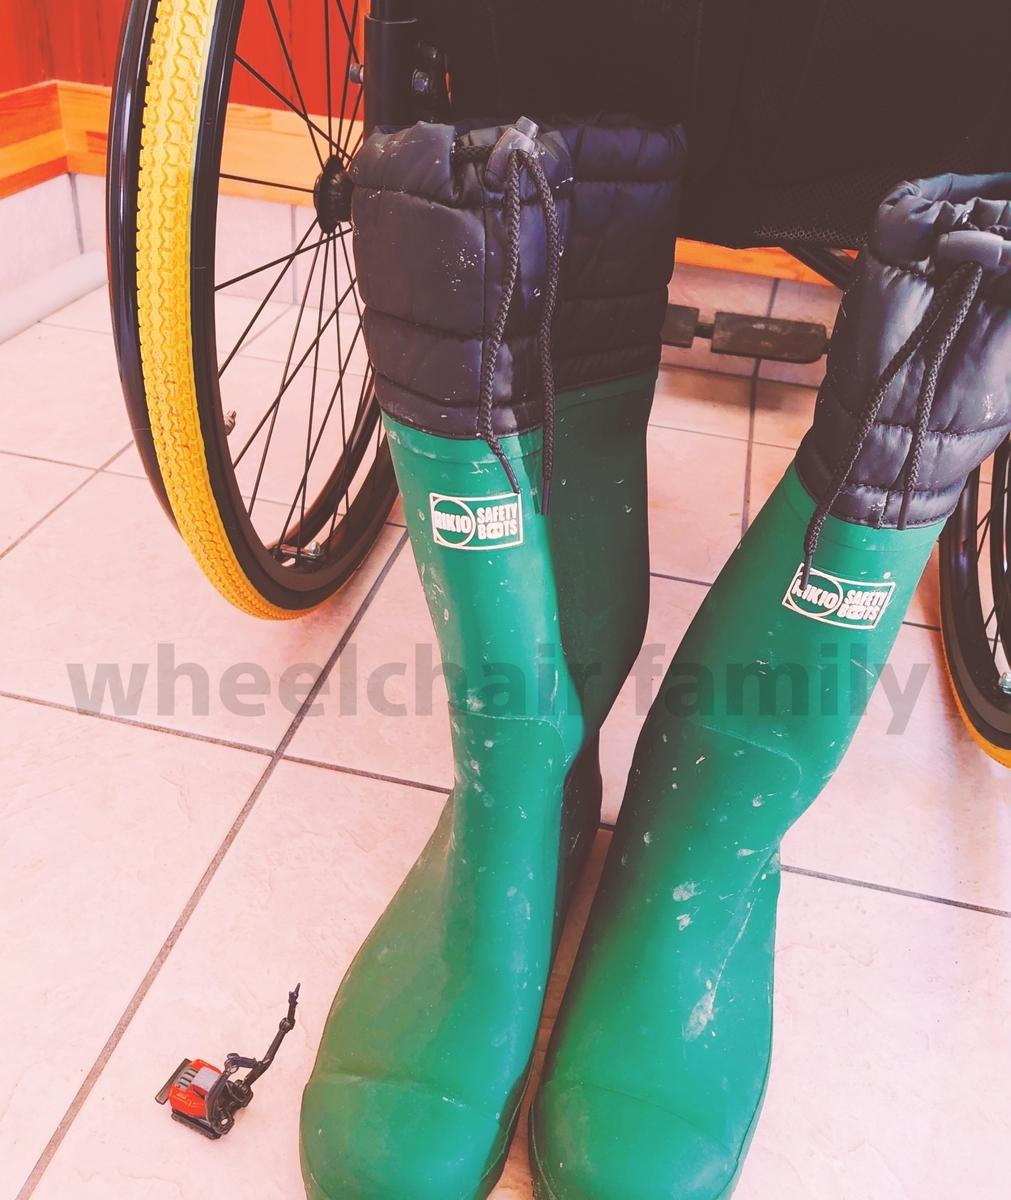 f:id:WheelchairFamily:20191028140818j:plain